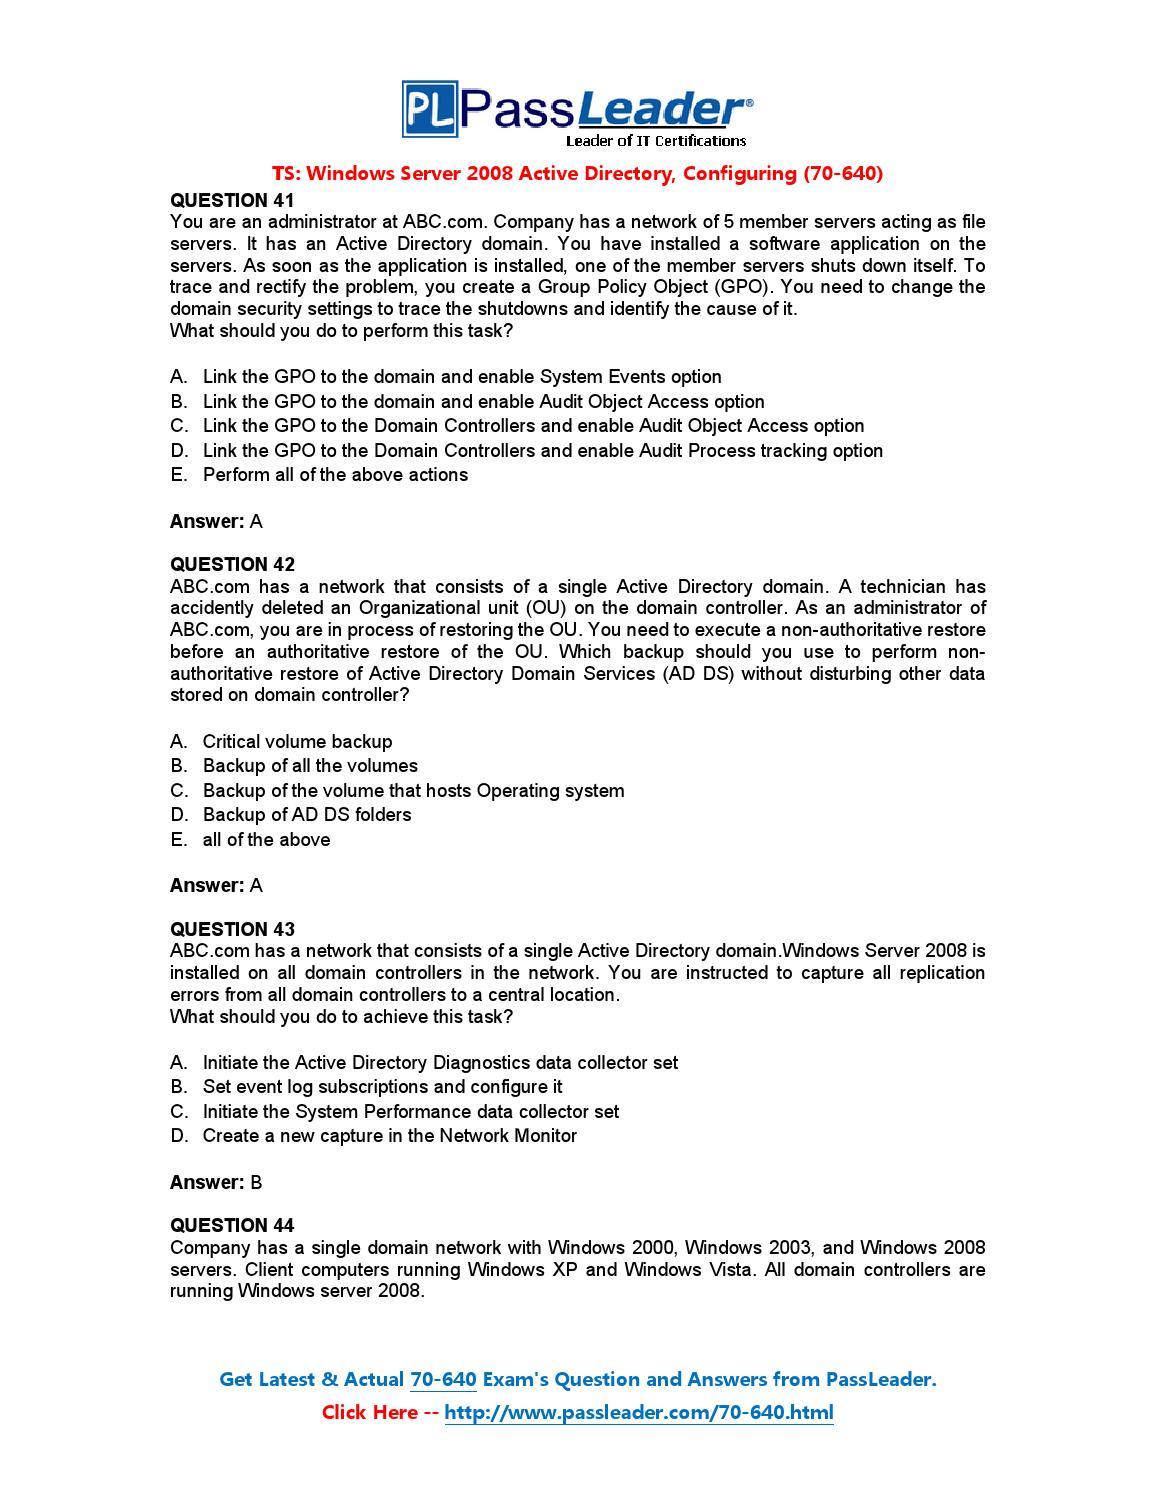 2008 directory active pdf windows 70-640 server